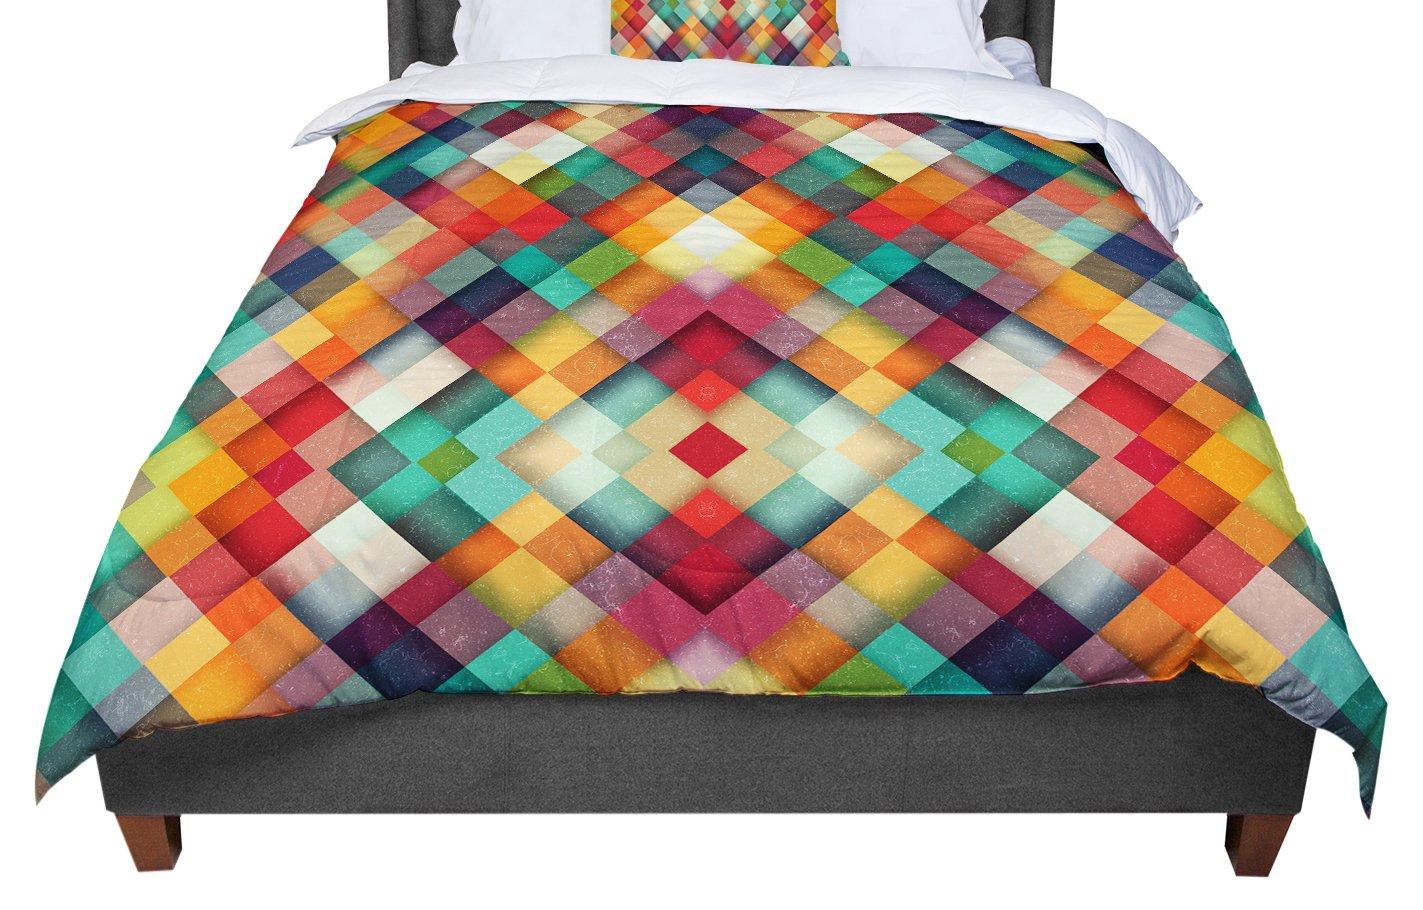 KESS InHouse Danny Ivan Time Between Geometric Abstract Twin Comforter 68 X 88